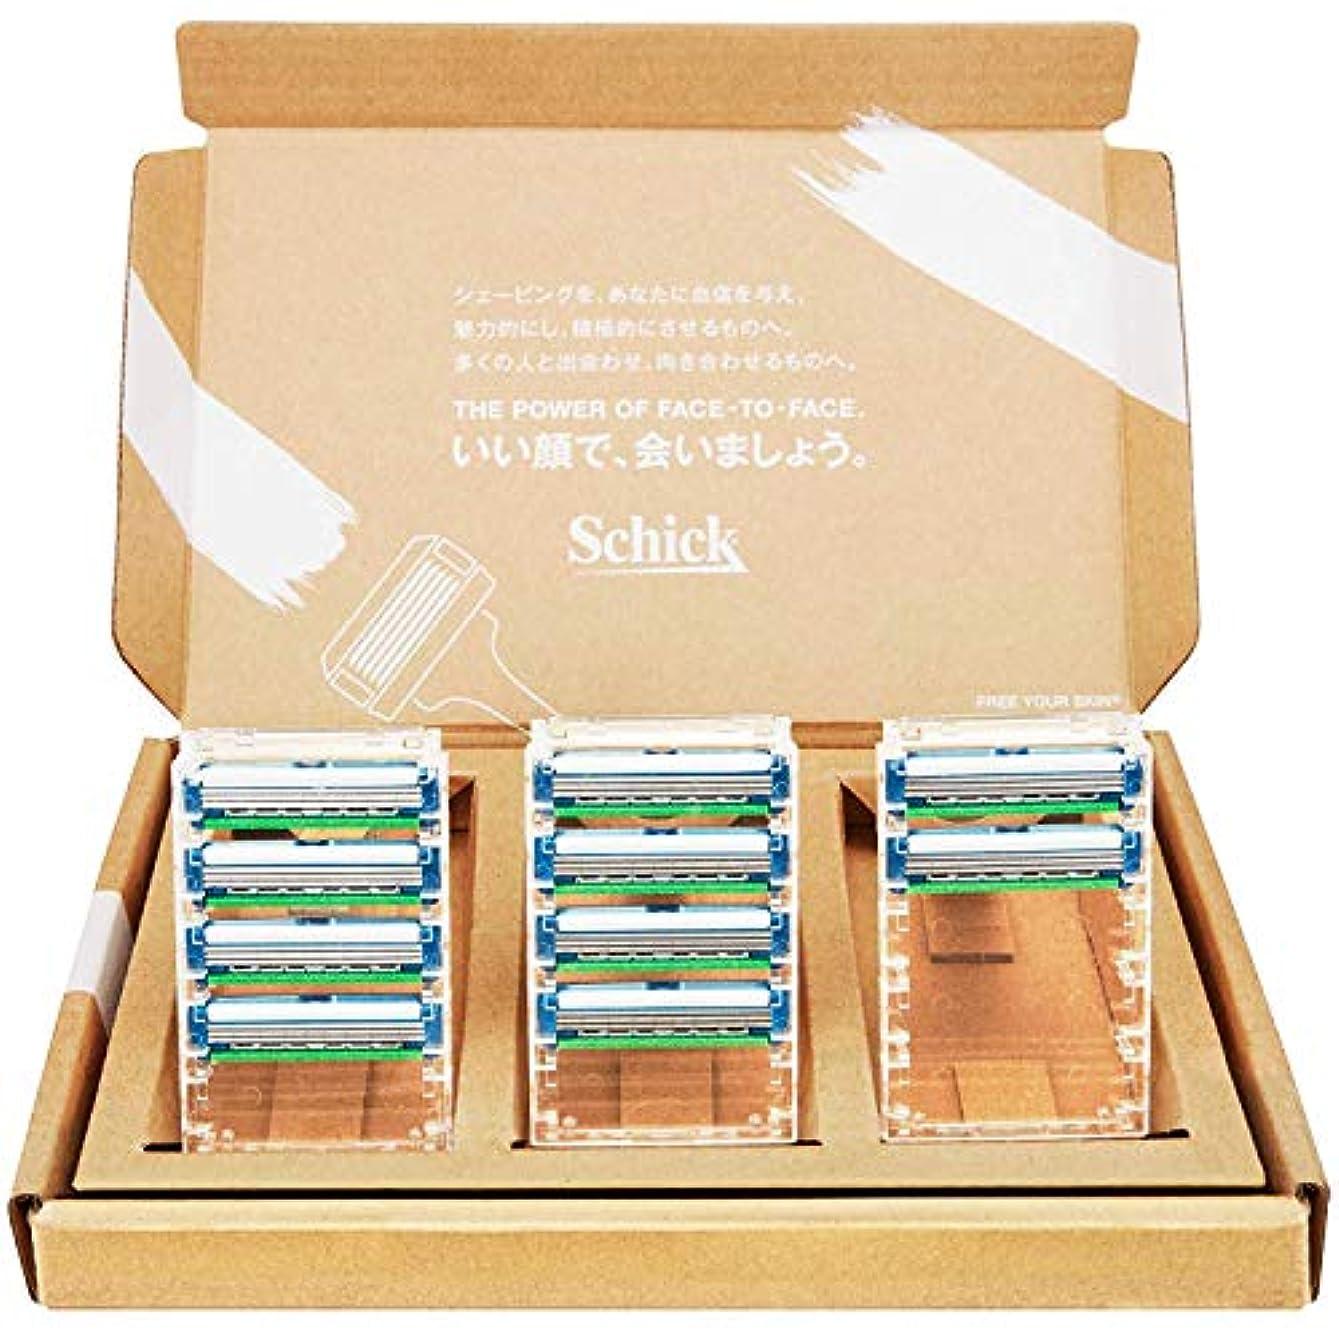 【Amazon.co.jp 限定】シック プロテクタースリー 替刃 10コ入